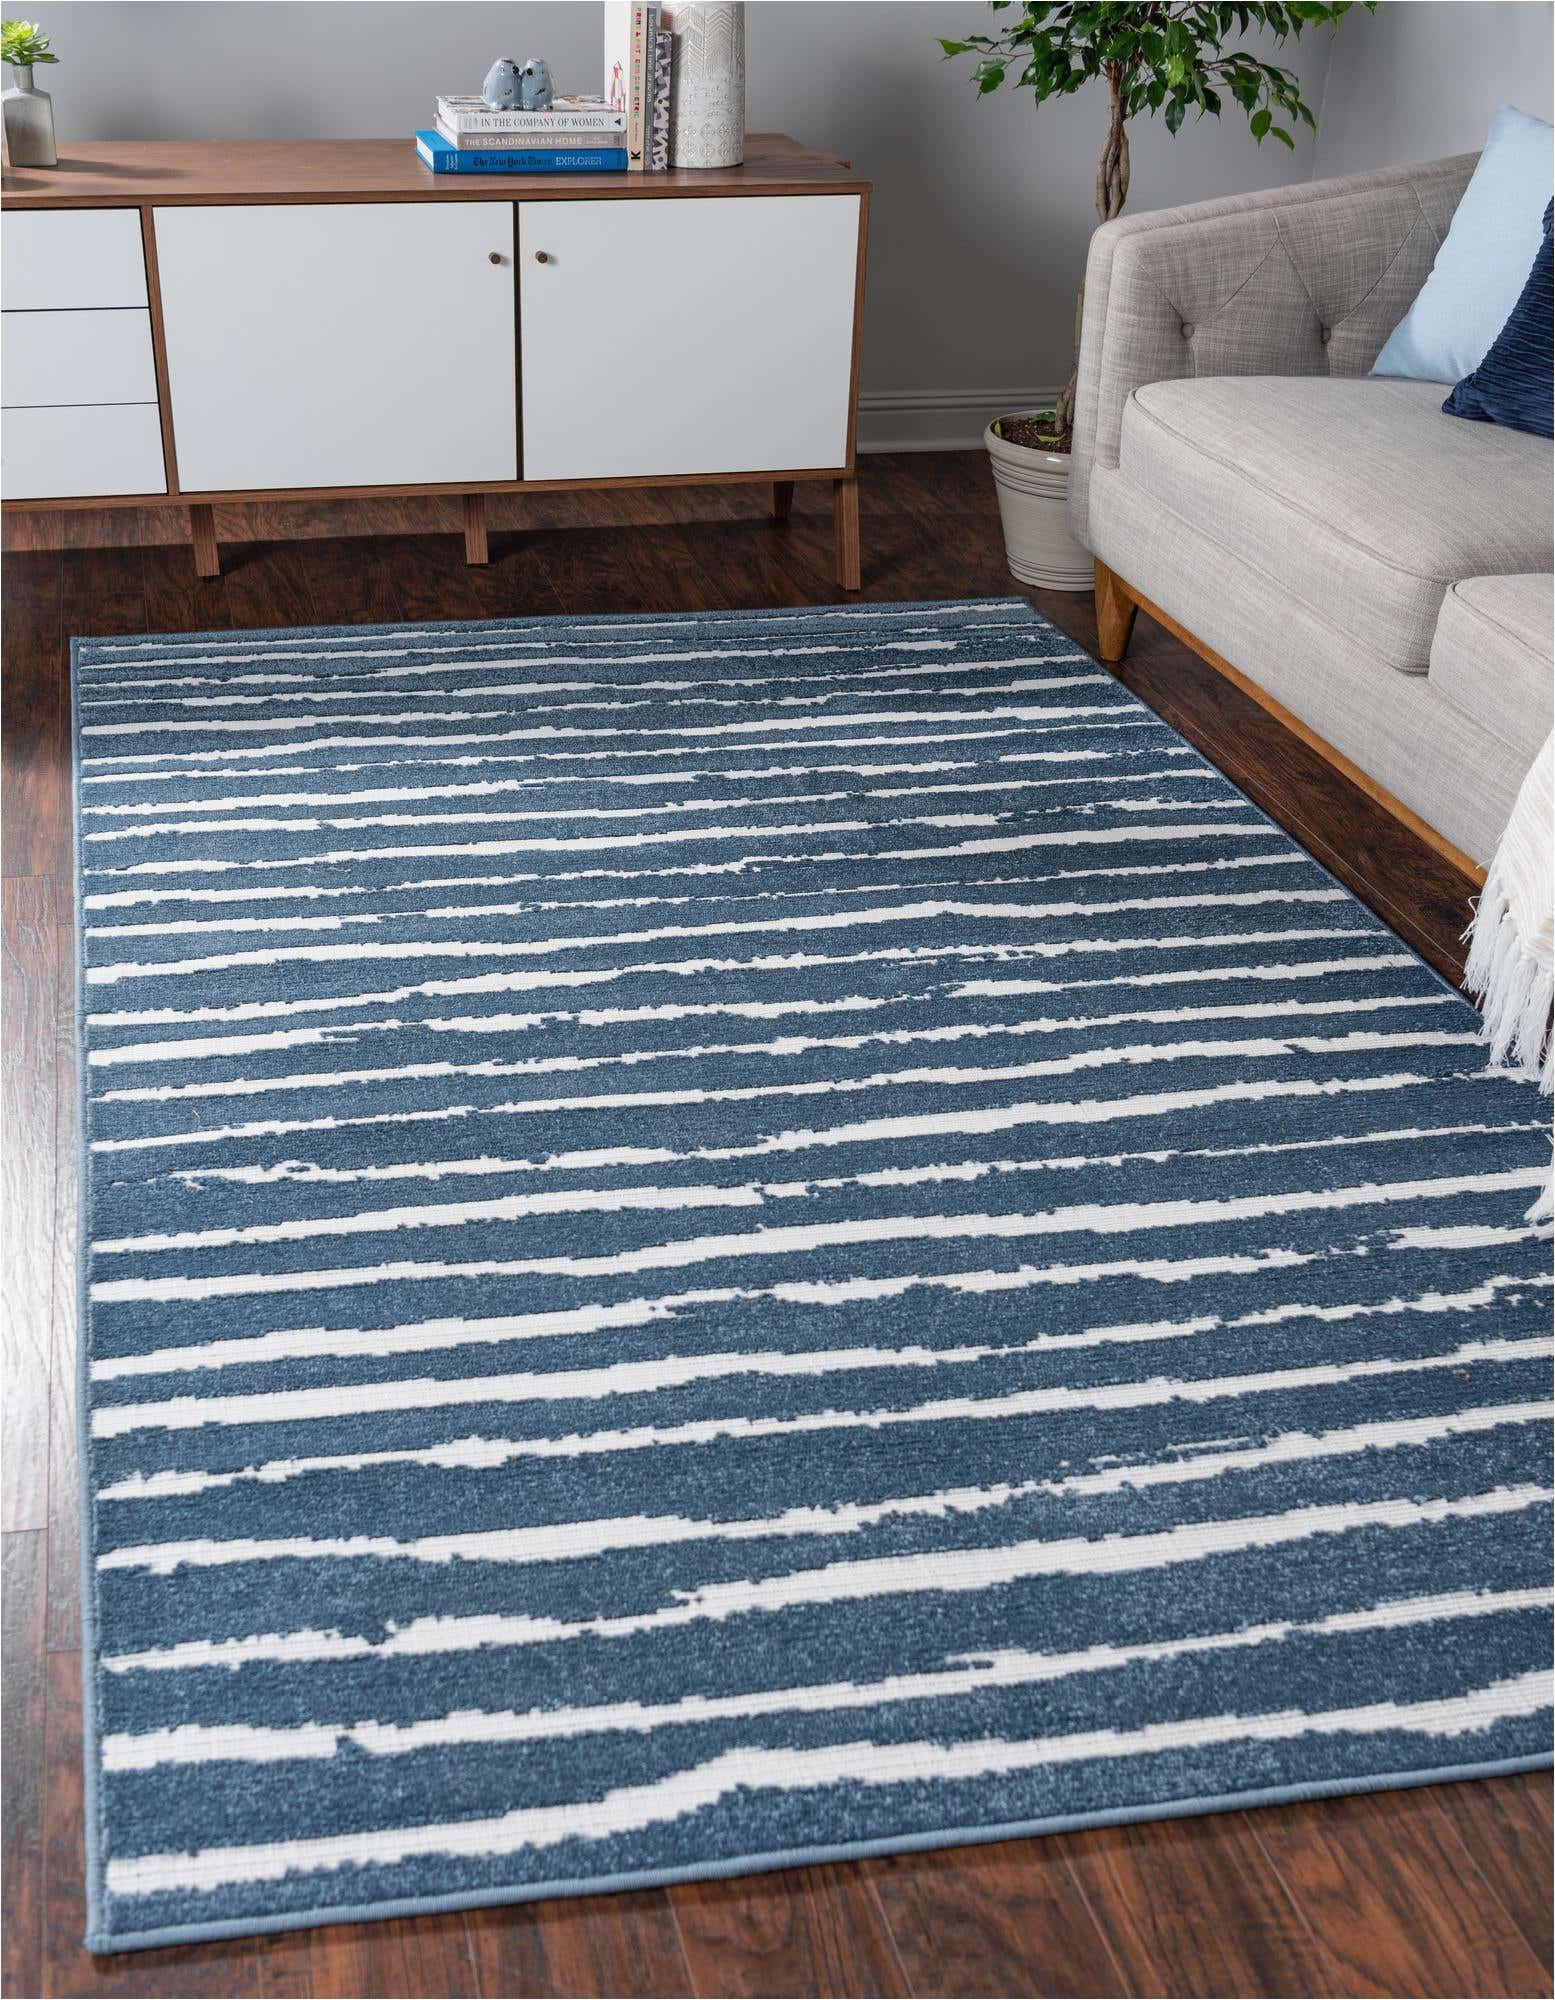 blue 9x12 sabrina soto outdoor area rug pos=6&rt=